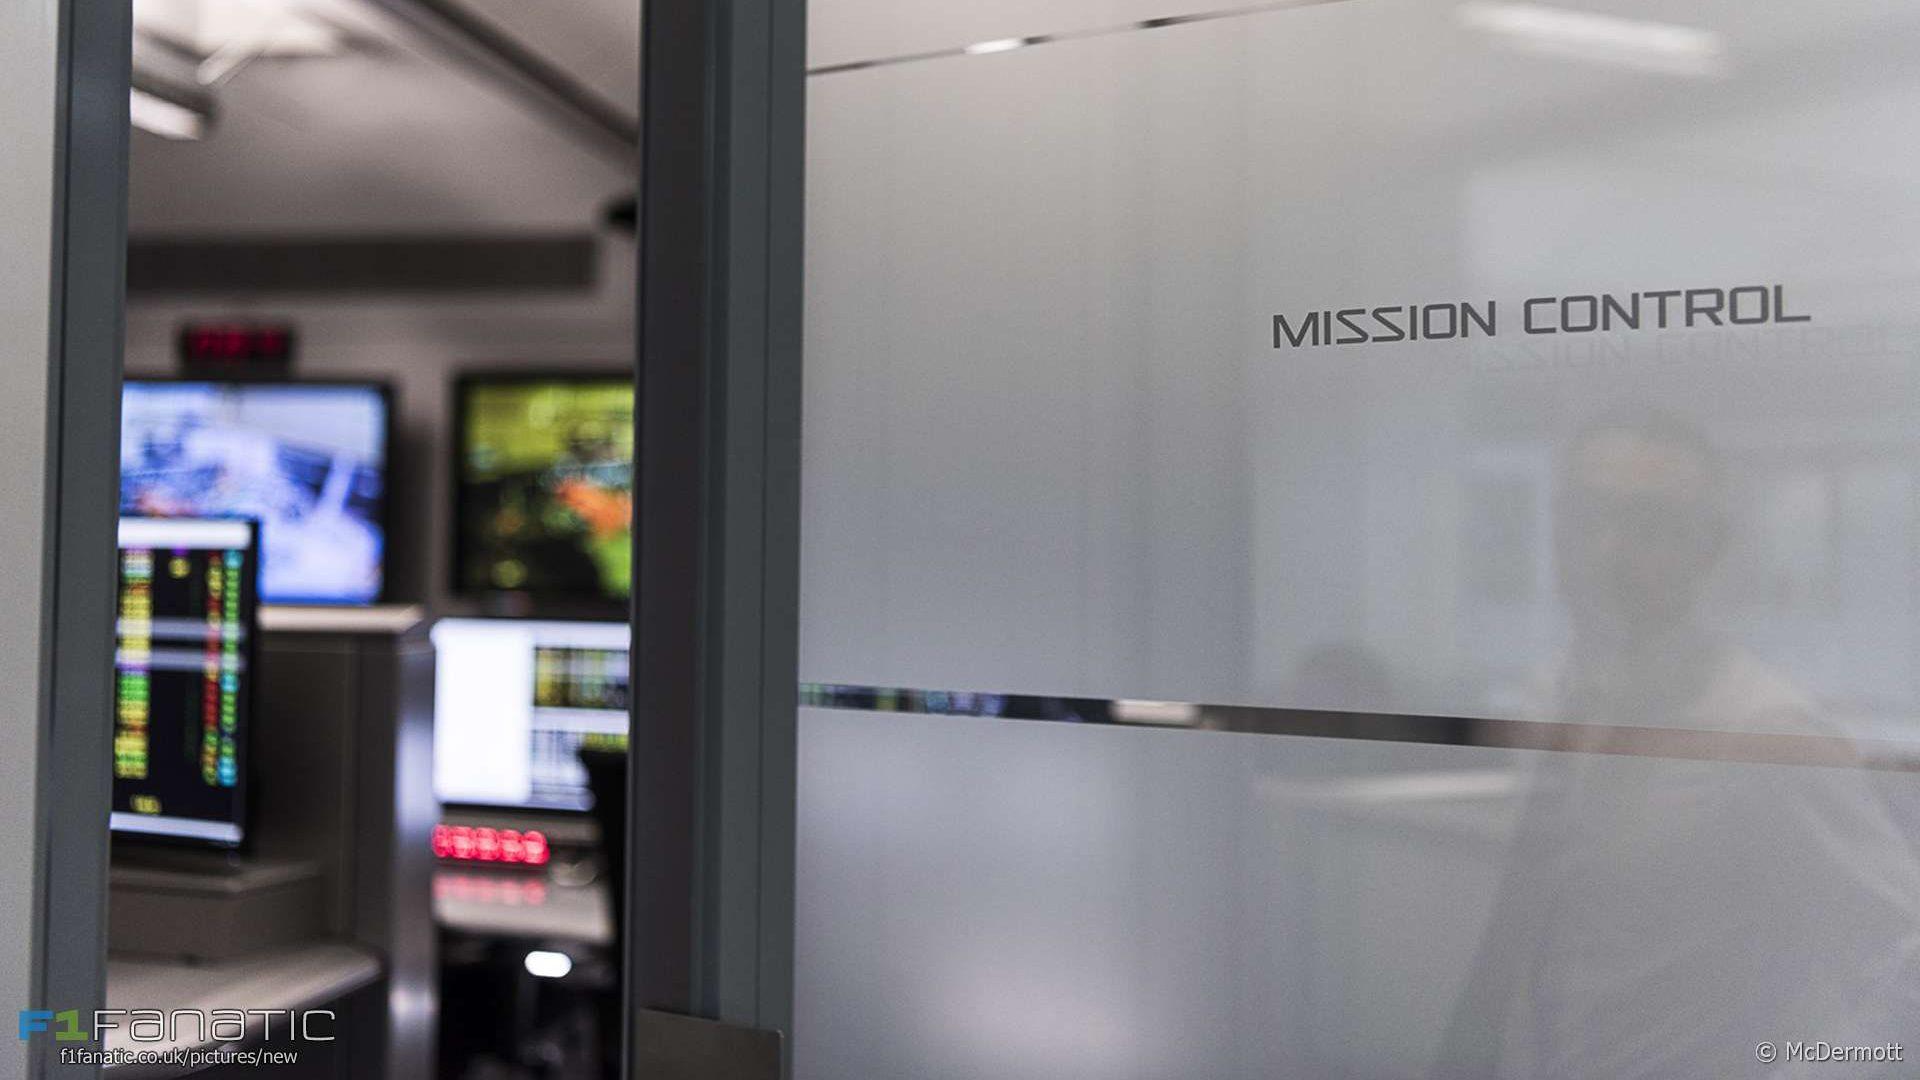 McLarenHQ_MissionControl_SM_182.LA_-e151